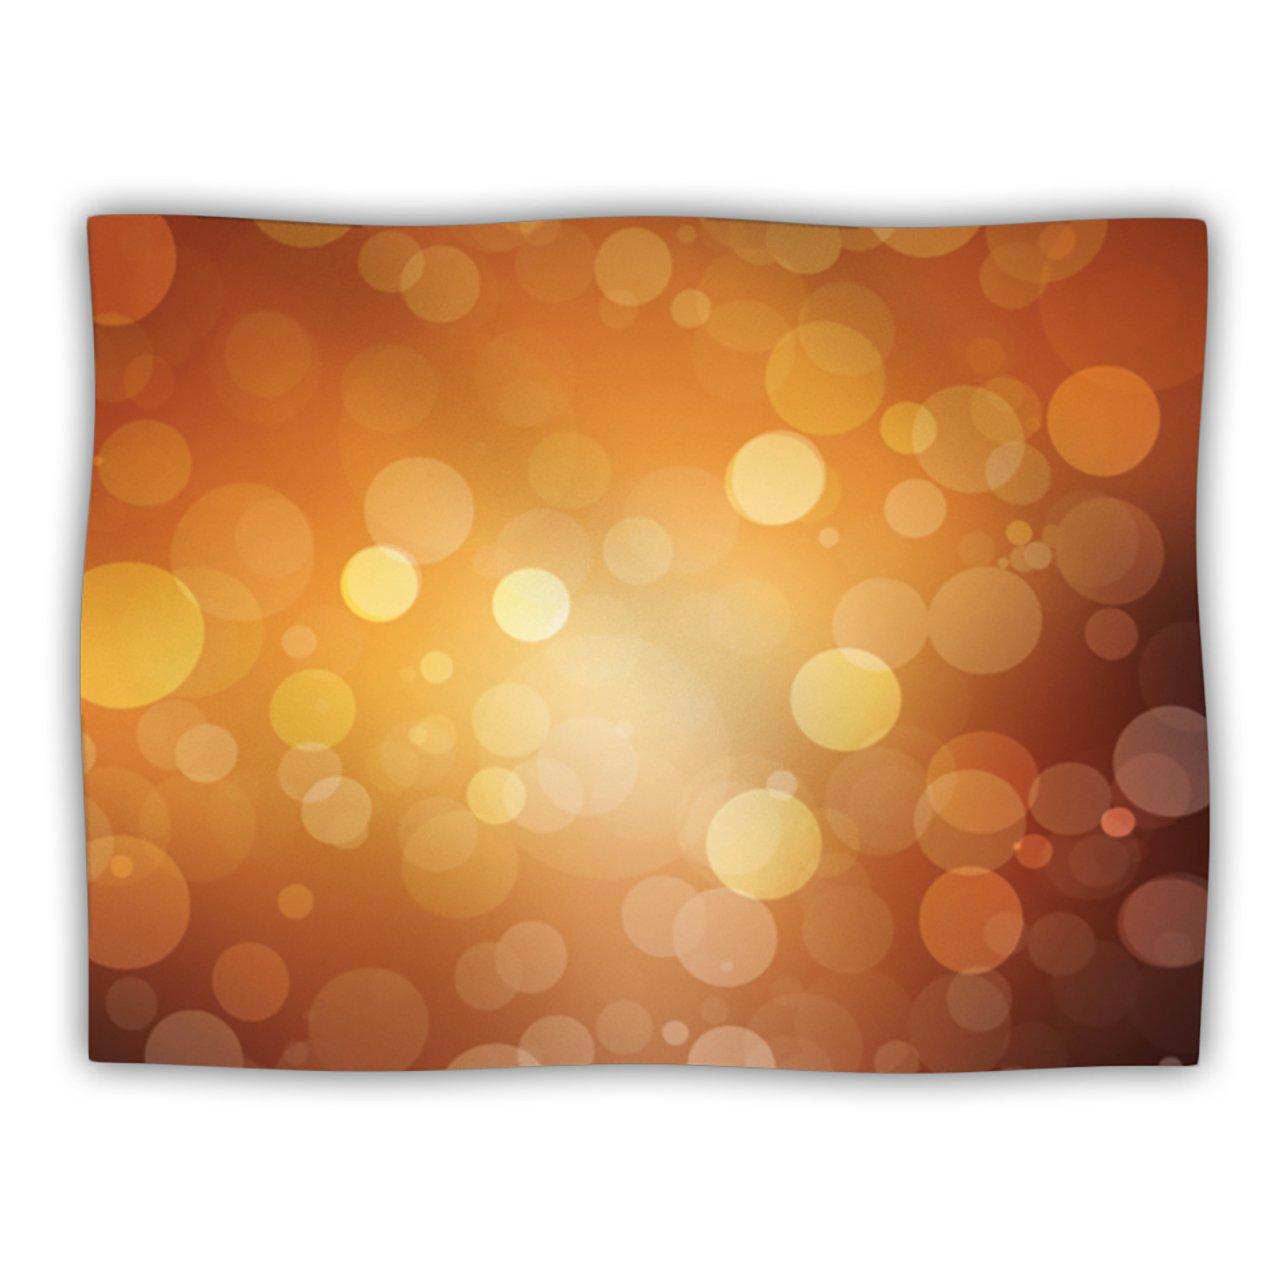 Kess InHouse Kess Original Sunrise  orange Bokeh Pet Dog Blanket, 60 by 50-Inch